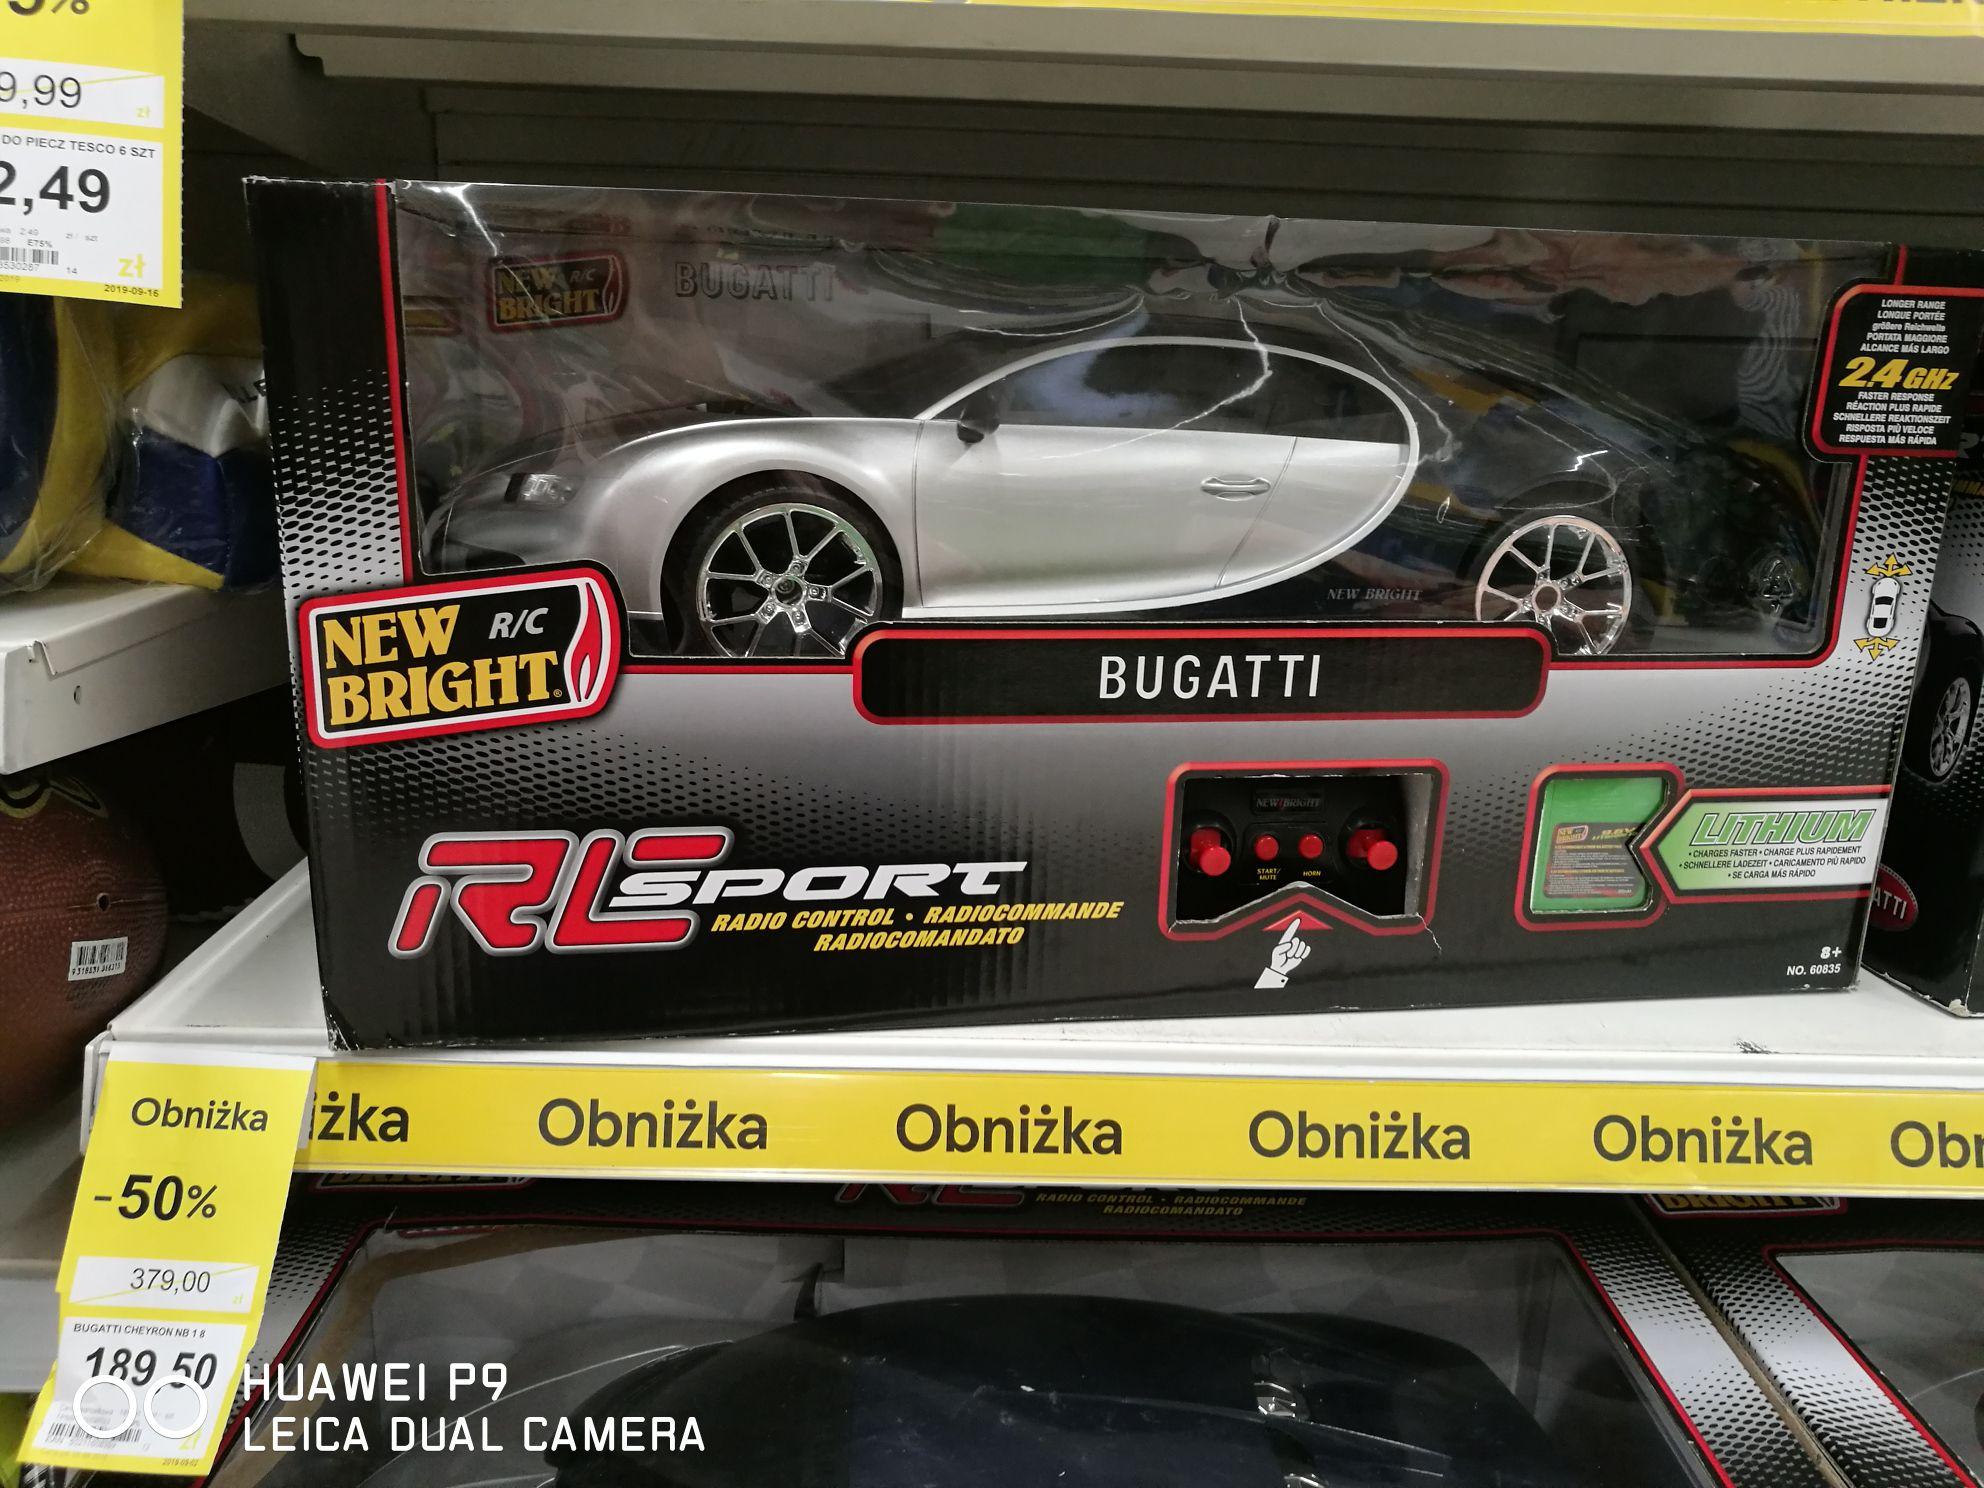 Czekolada Milka Chips Ahoy, Goralki, auto Bugatti